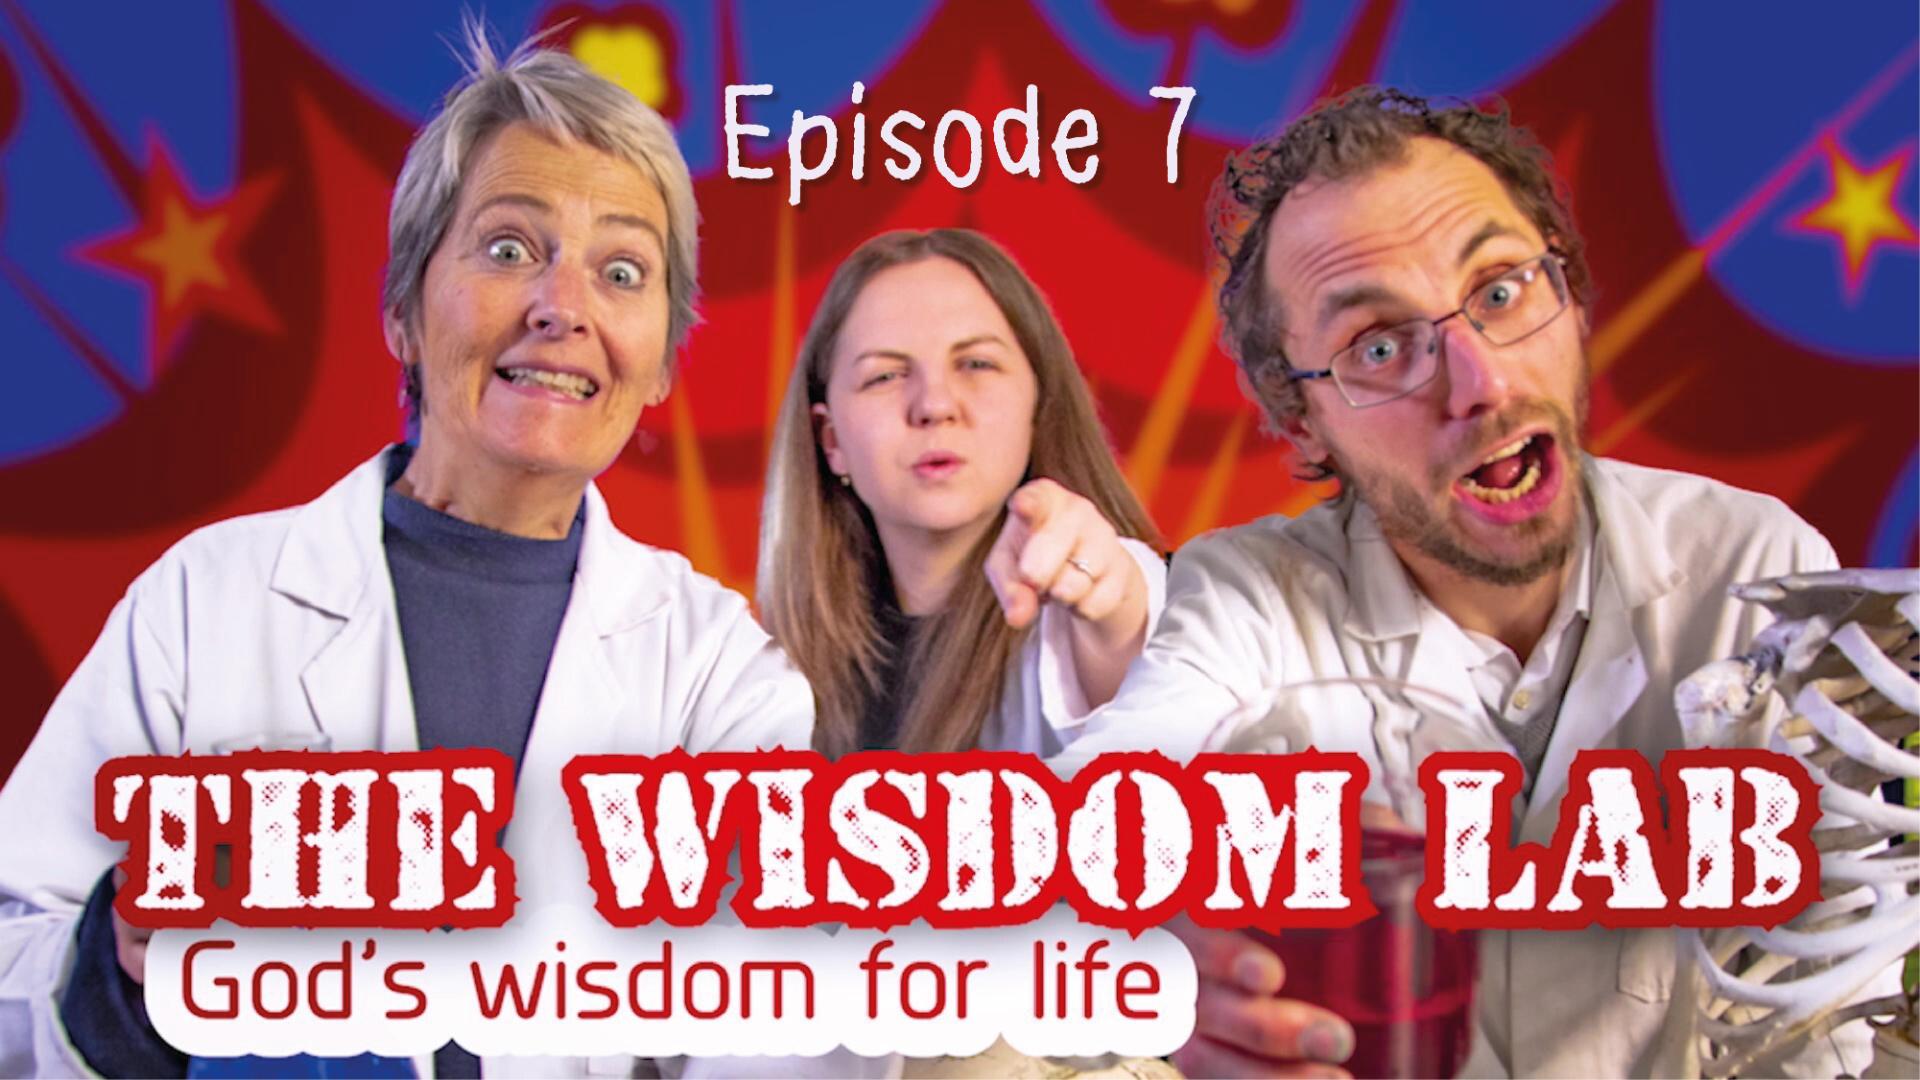 The Wisdom Lab: Episode 7